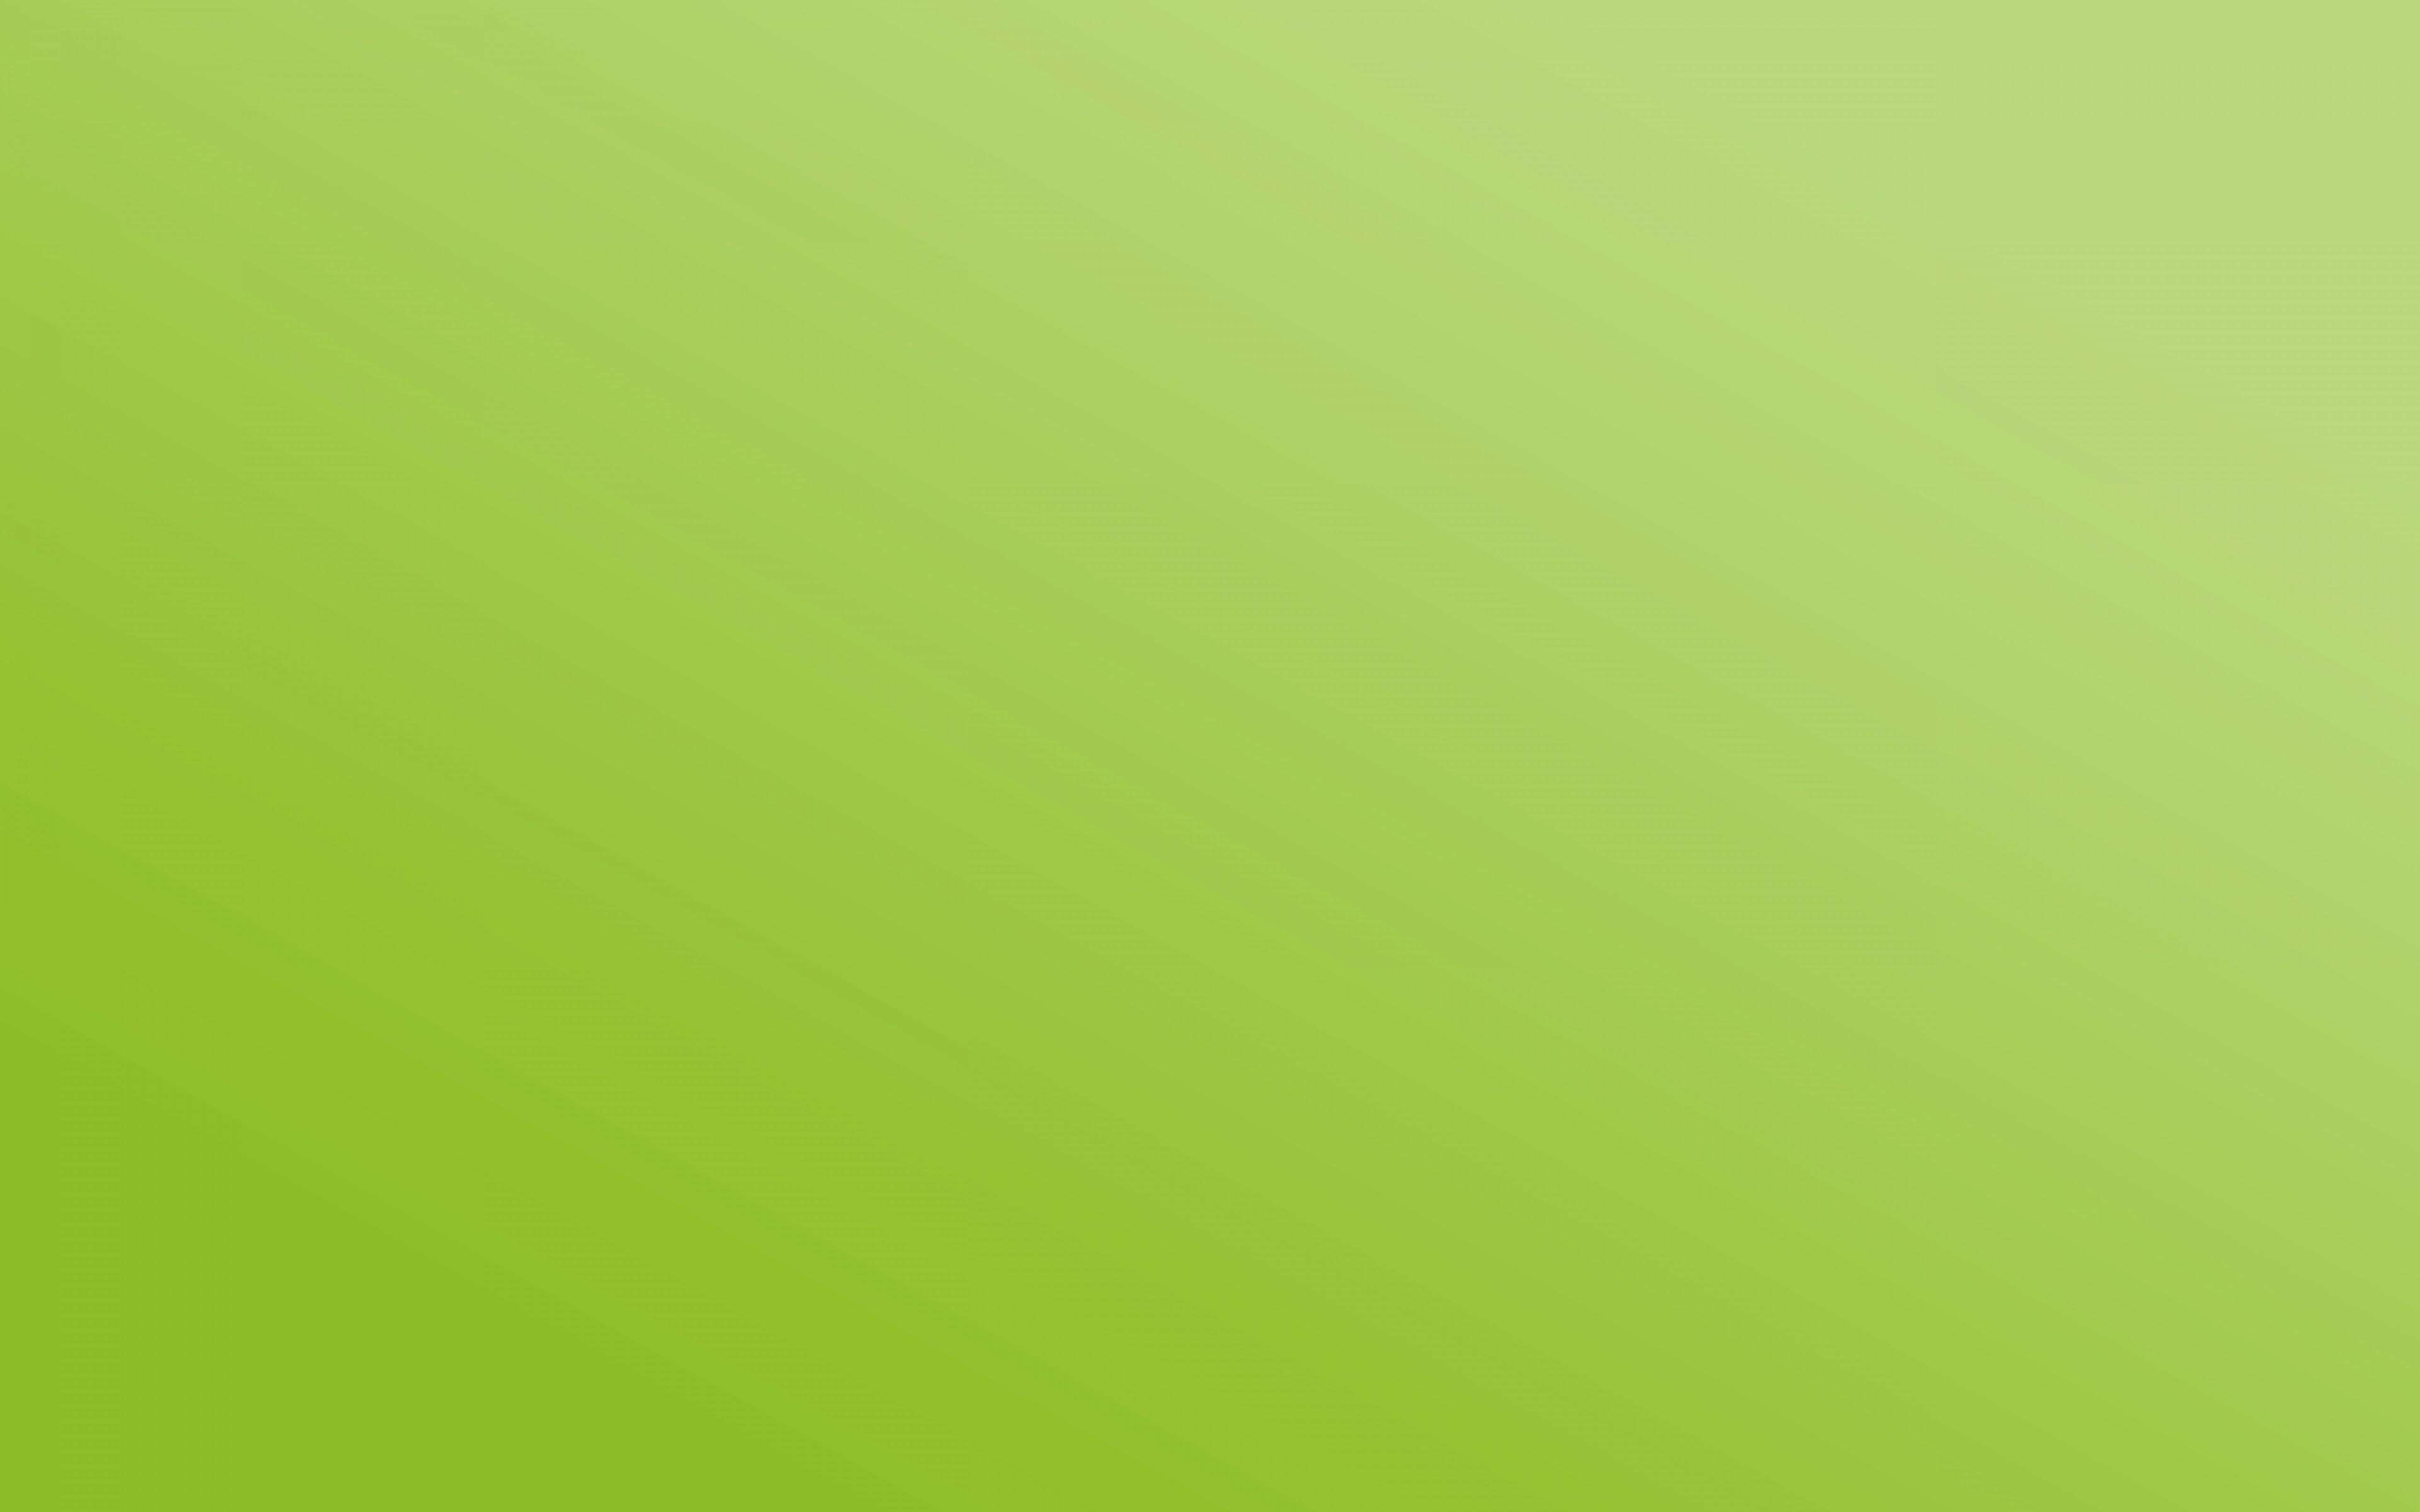 HD Backgrounds Solid Color   PixelsTalk.Net